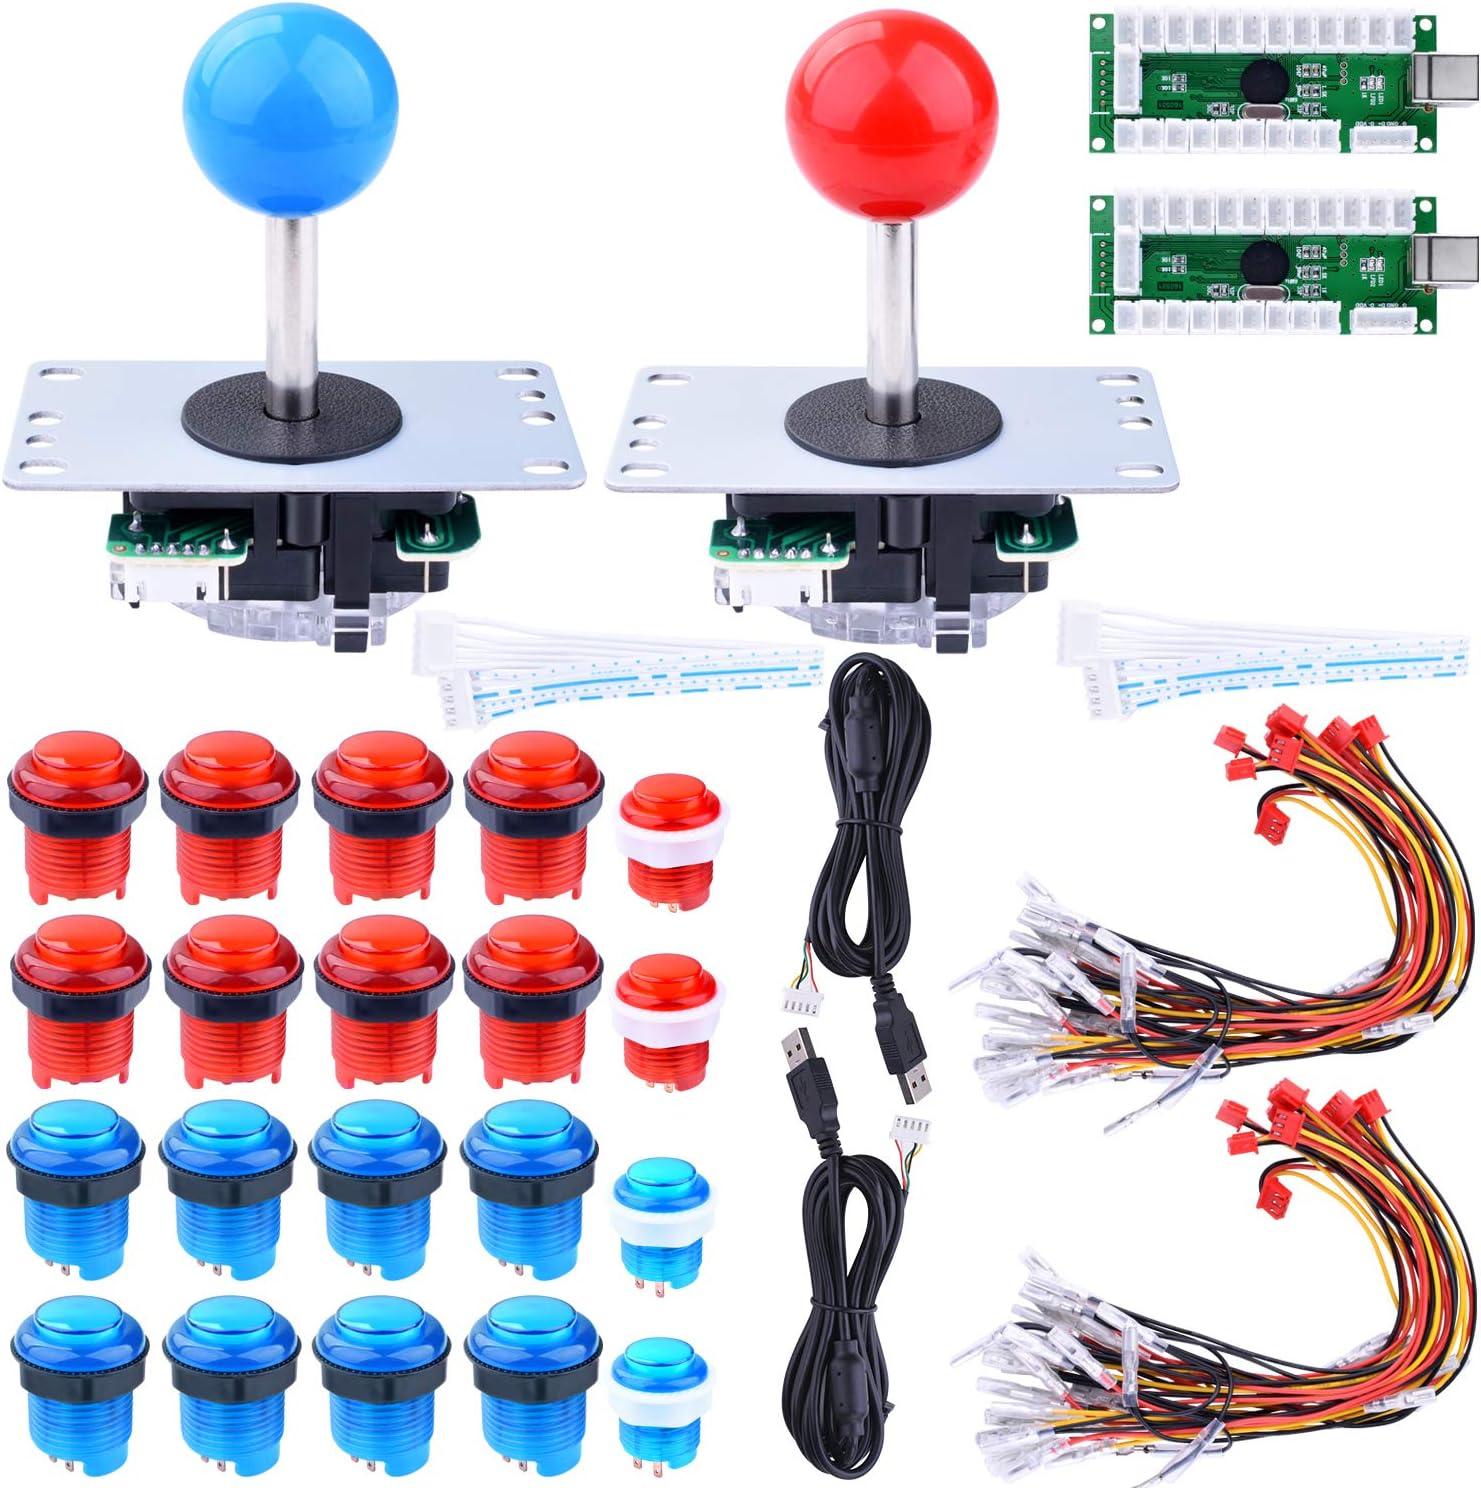 Joystick Arcade Raspberry Pi 3 2 model B, Joystick Mandos Arcade kit de Bricolaje Codificador USB 2x Zero Delay + 2x 8 Way Joystick